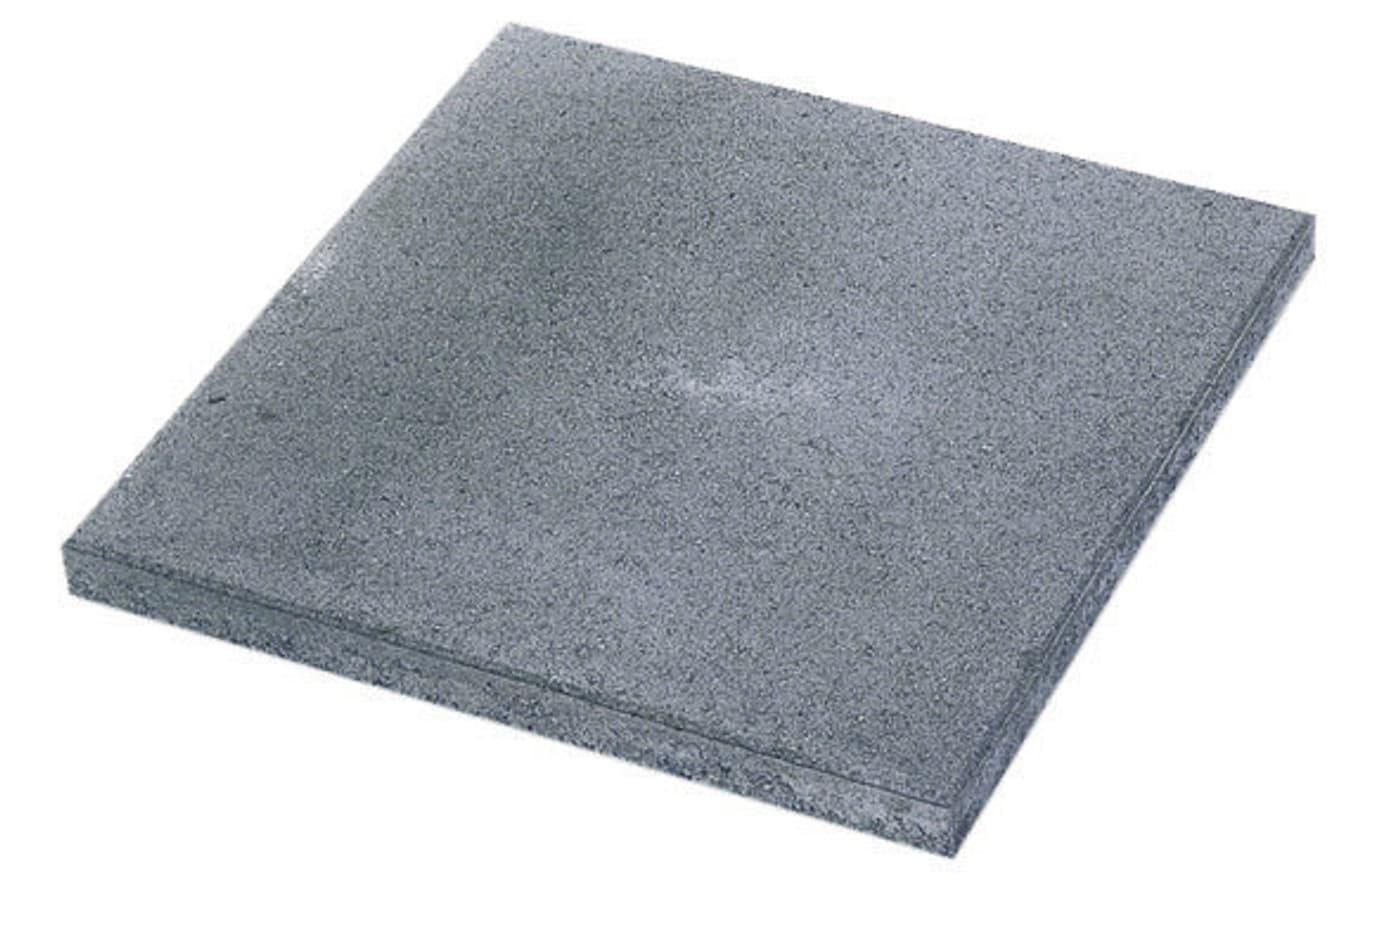 gehwegplatten glatt 50x50 cm migros. Black Bedroom Furniture Sets. Home Design Ideas